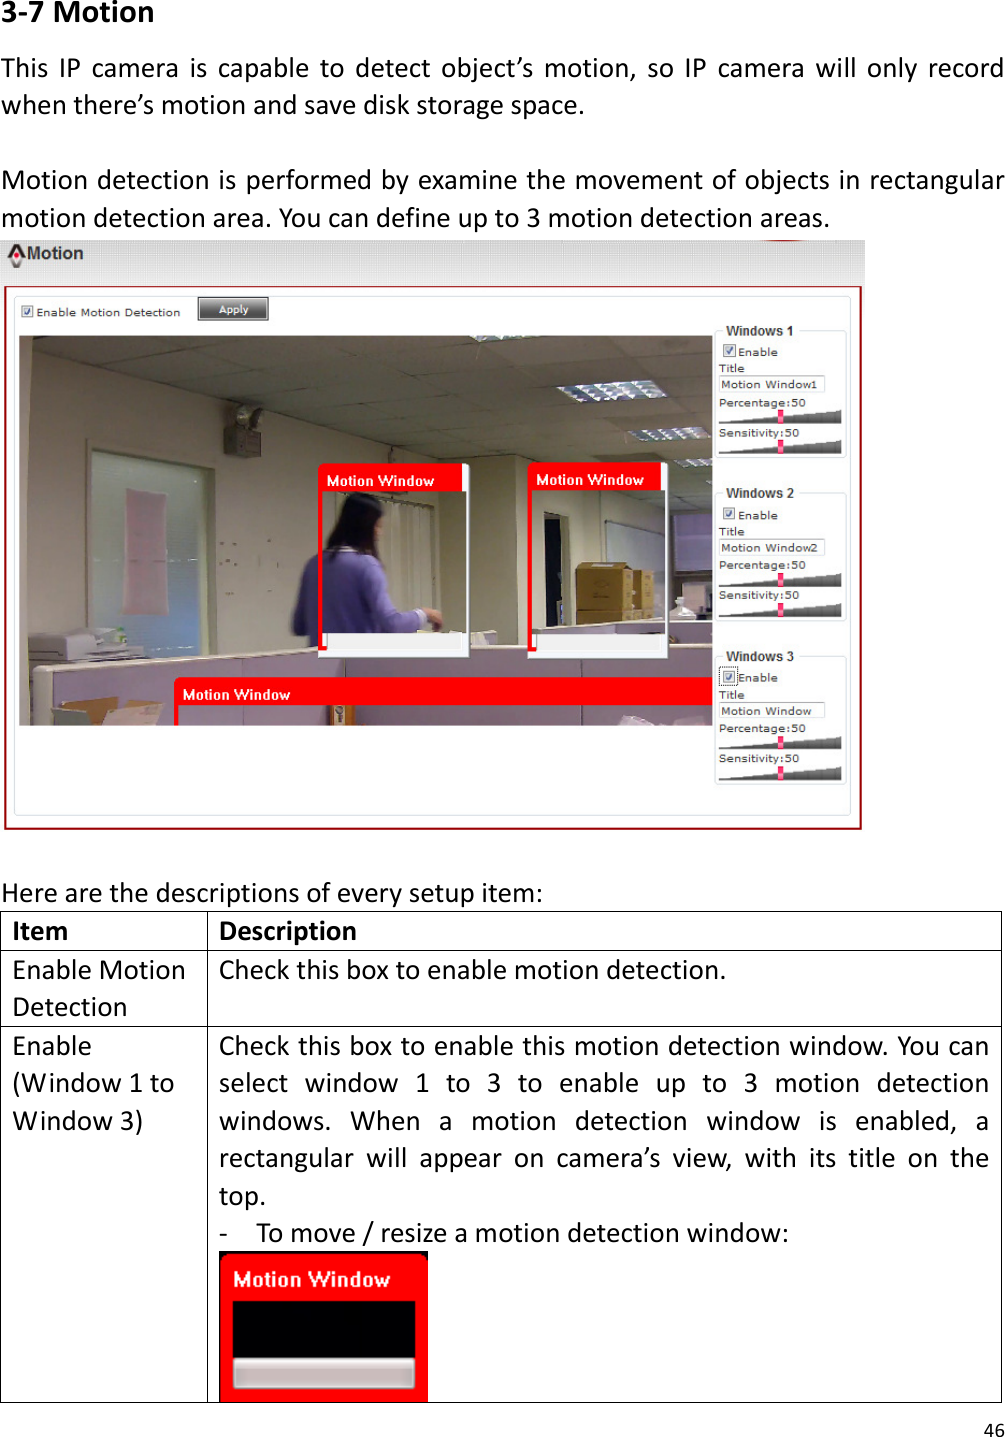 SMAX Technology 500WS320DM368 WIRELESS IP CAMERA User Manual